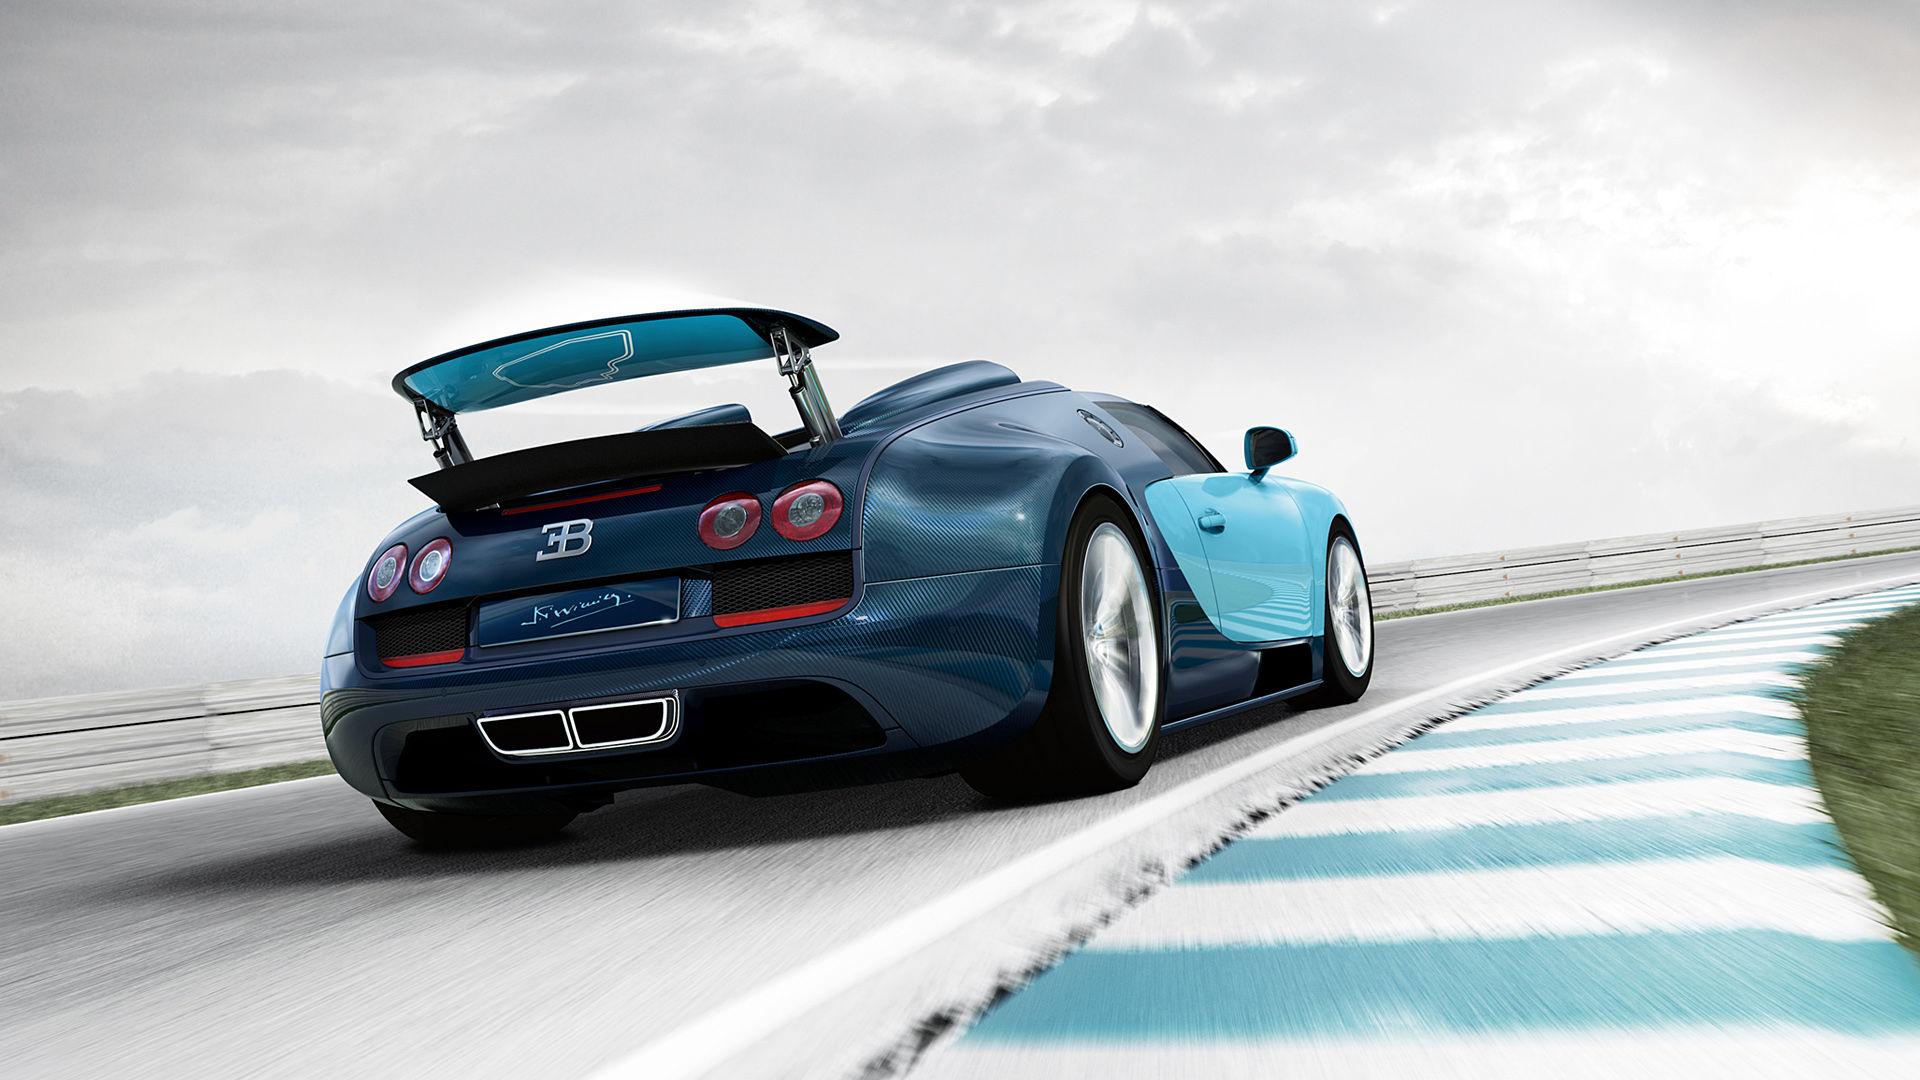 2013 Bugatti Veyron Jean-Pierre Wimille